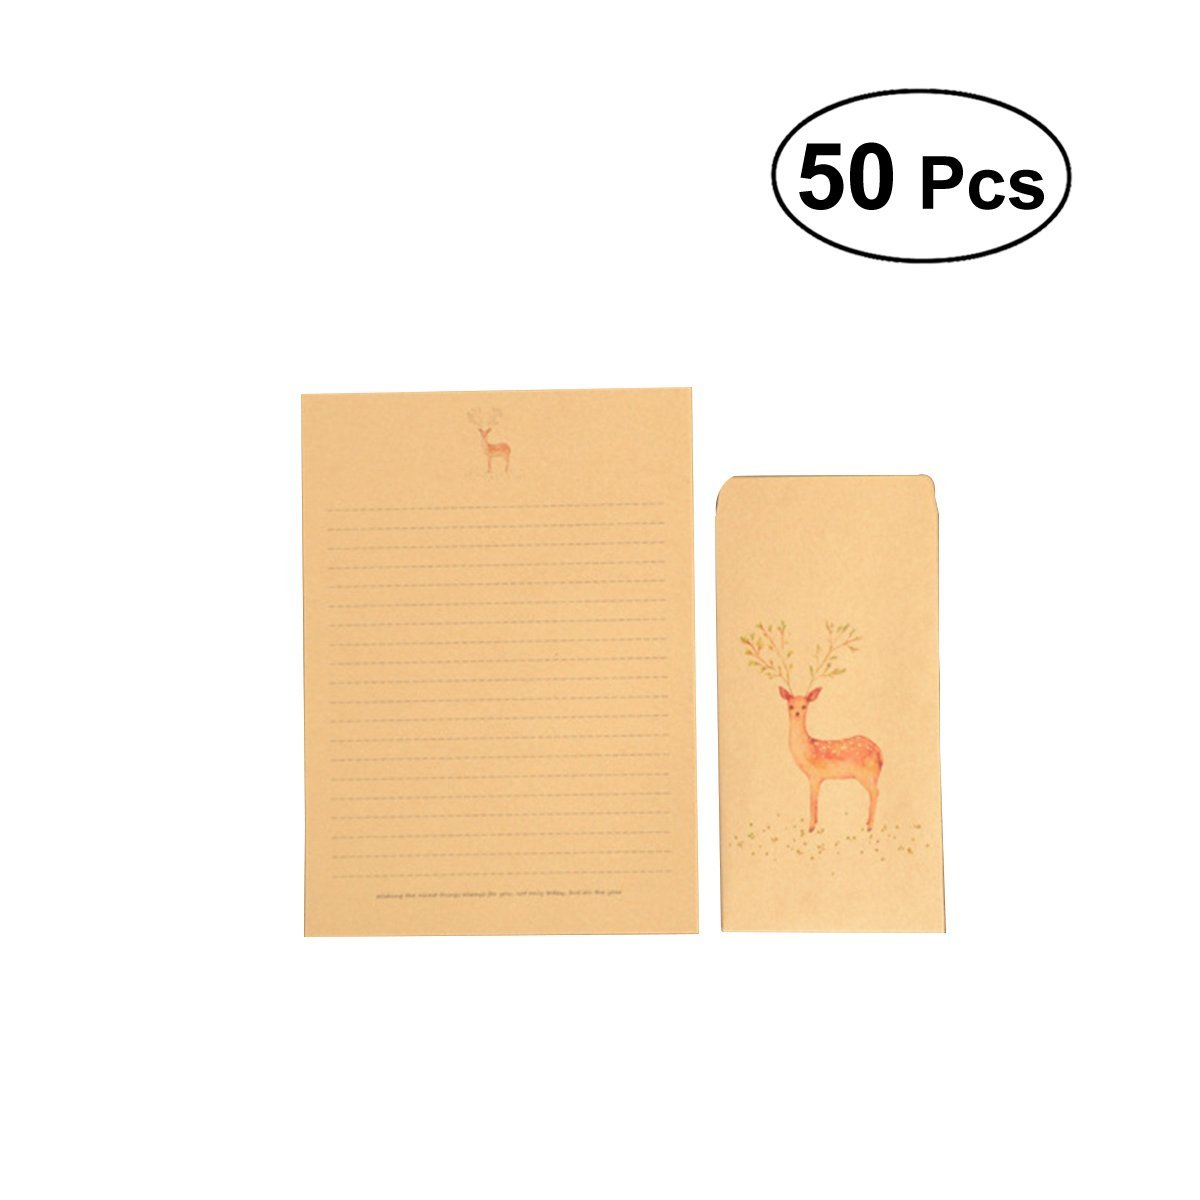 NUOLUX 50Pcs Vintage Writing Paper with Envelopes Set Stationery Letter Paper Kraft Brown Envelopes (Random Pattern)